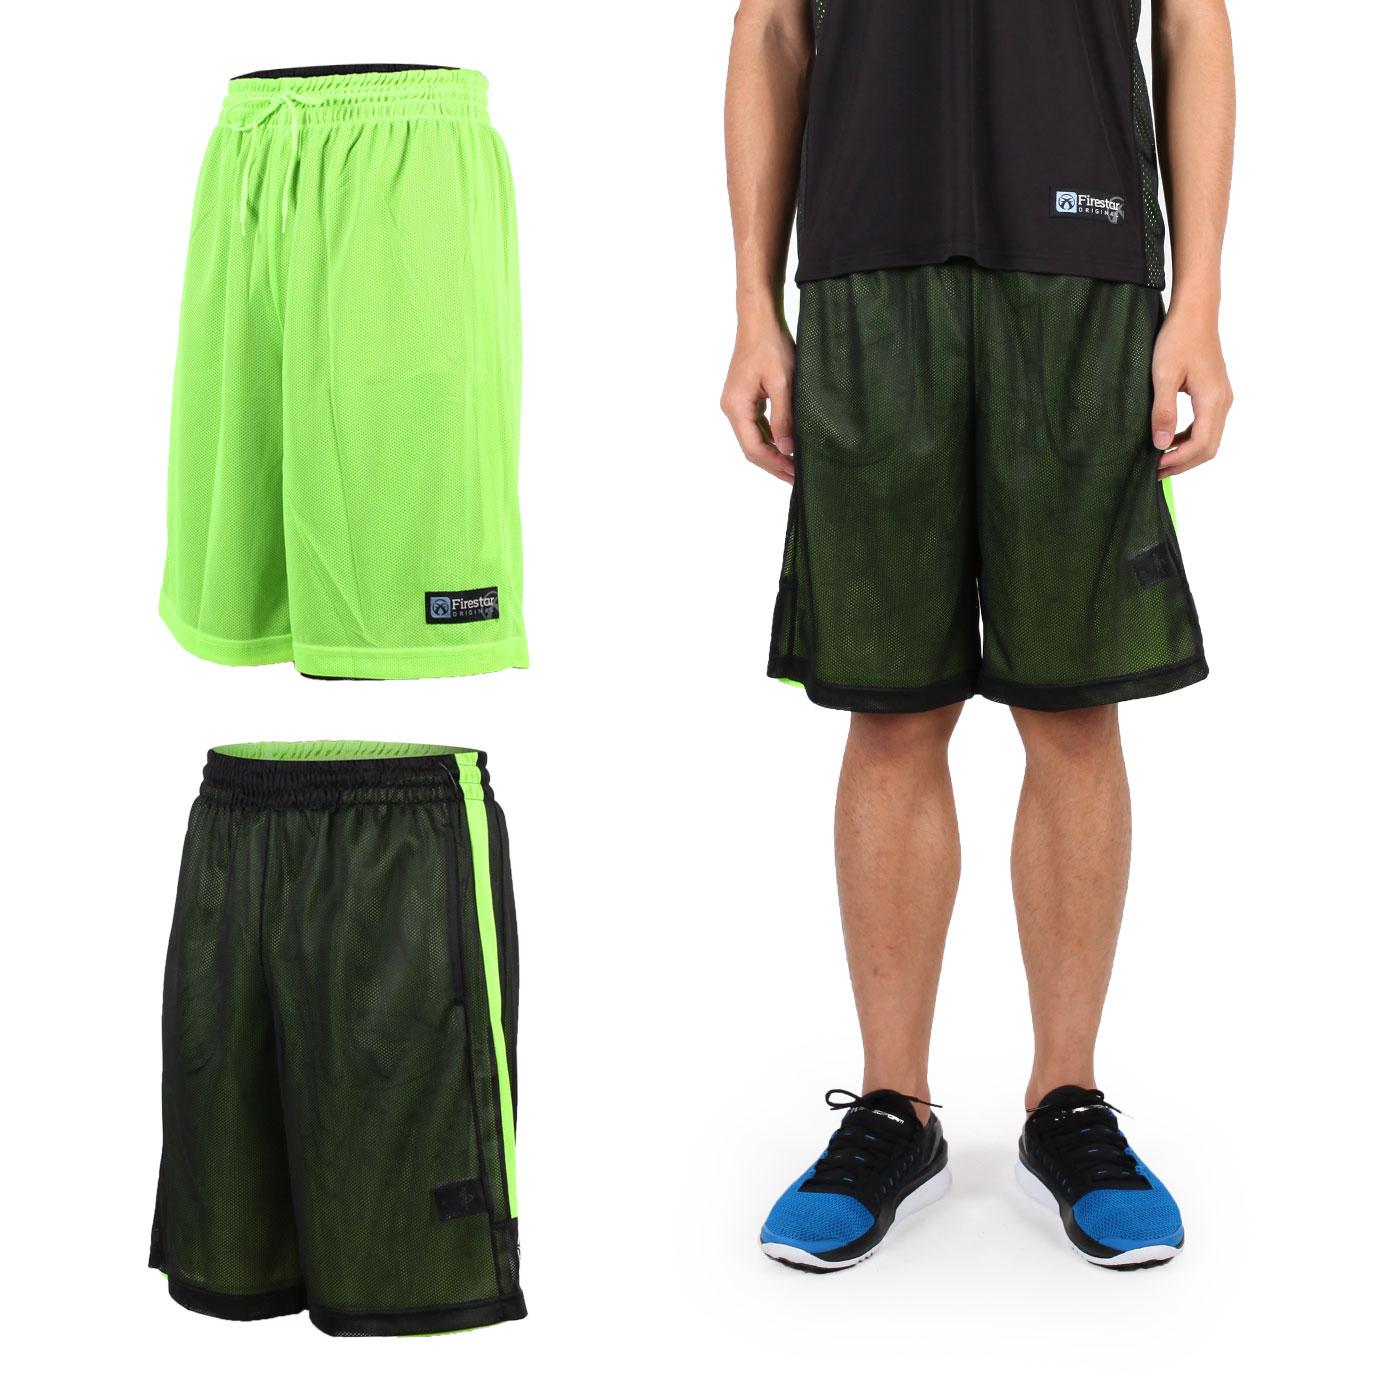 FIRESTAR 男雙面網布籃球褲 B6306-10 - 黑螢光綠